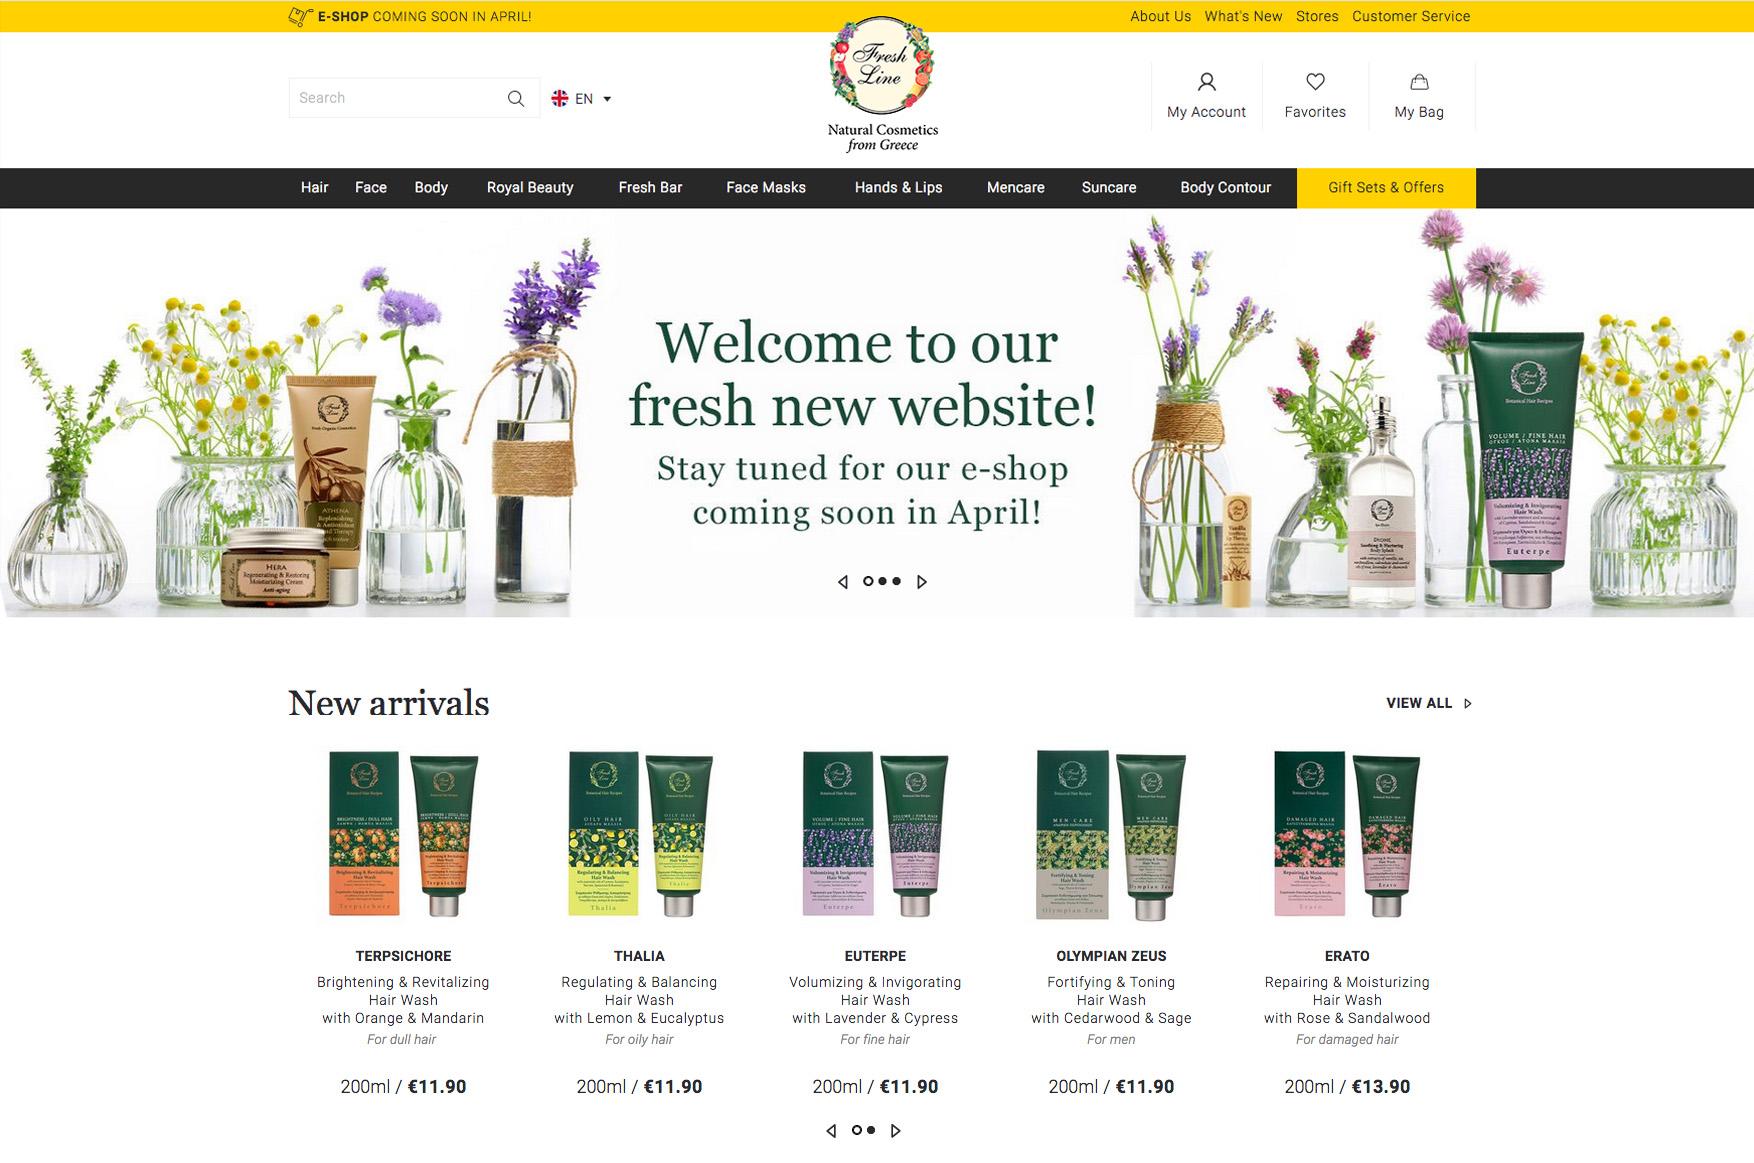 cfffe75e78 Τα αγαπημένα σας ελληνικά beauty προϊόντα έχουν πλέον e-shop και ...